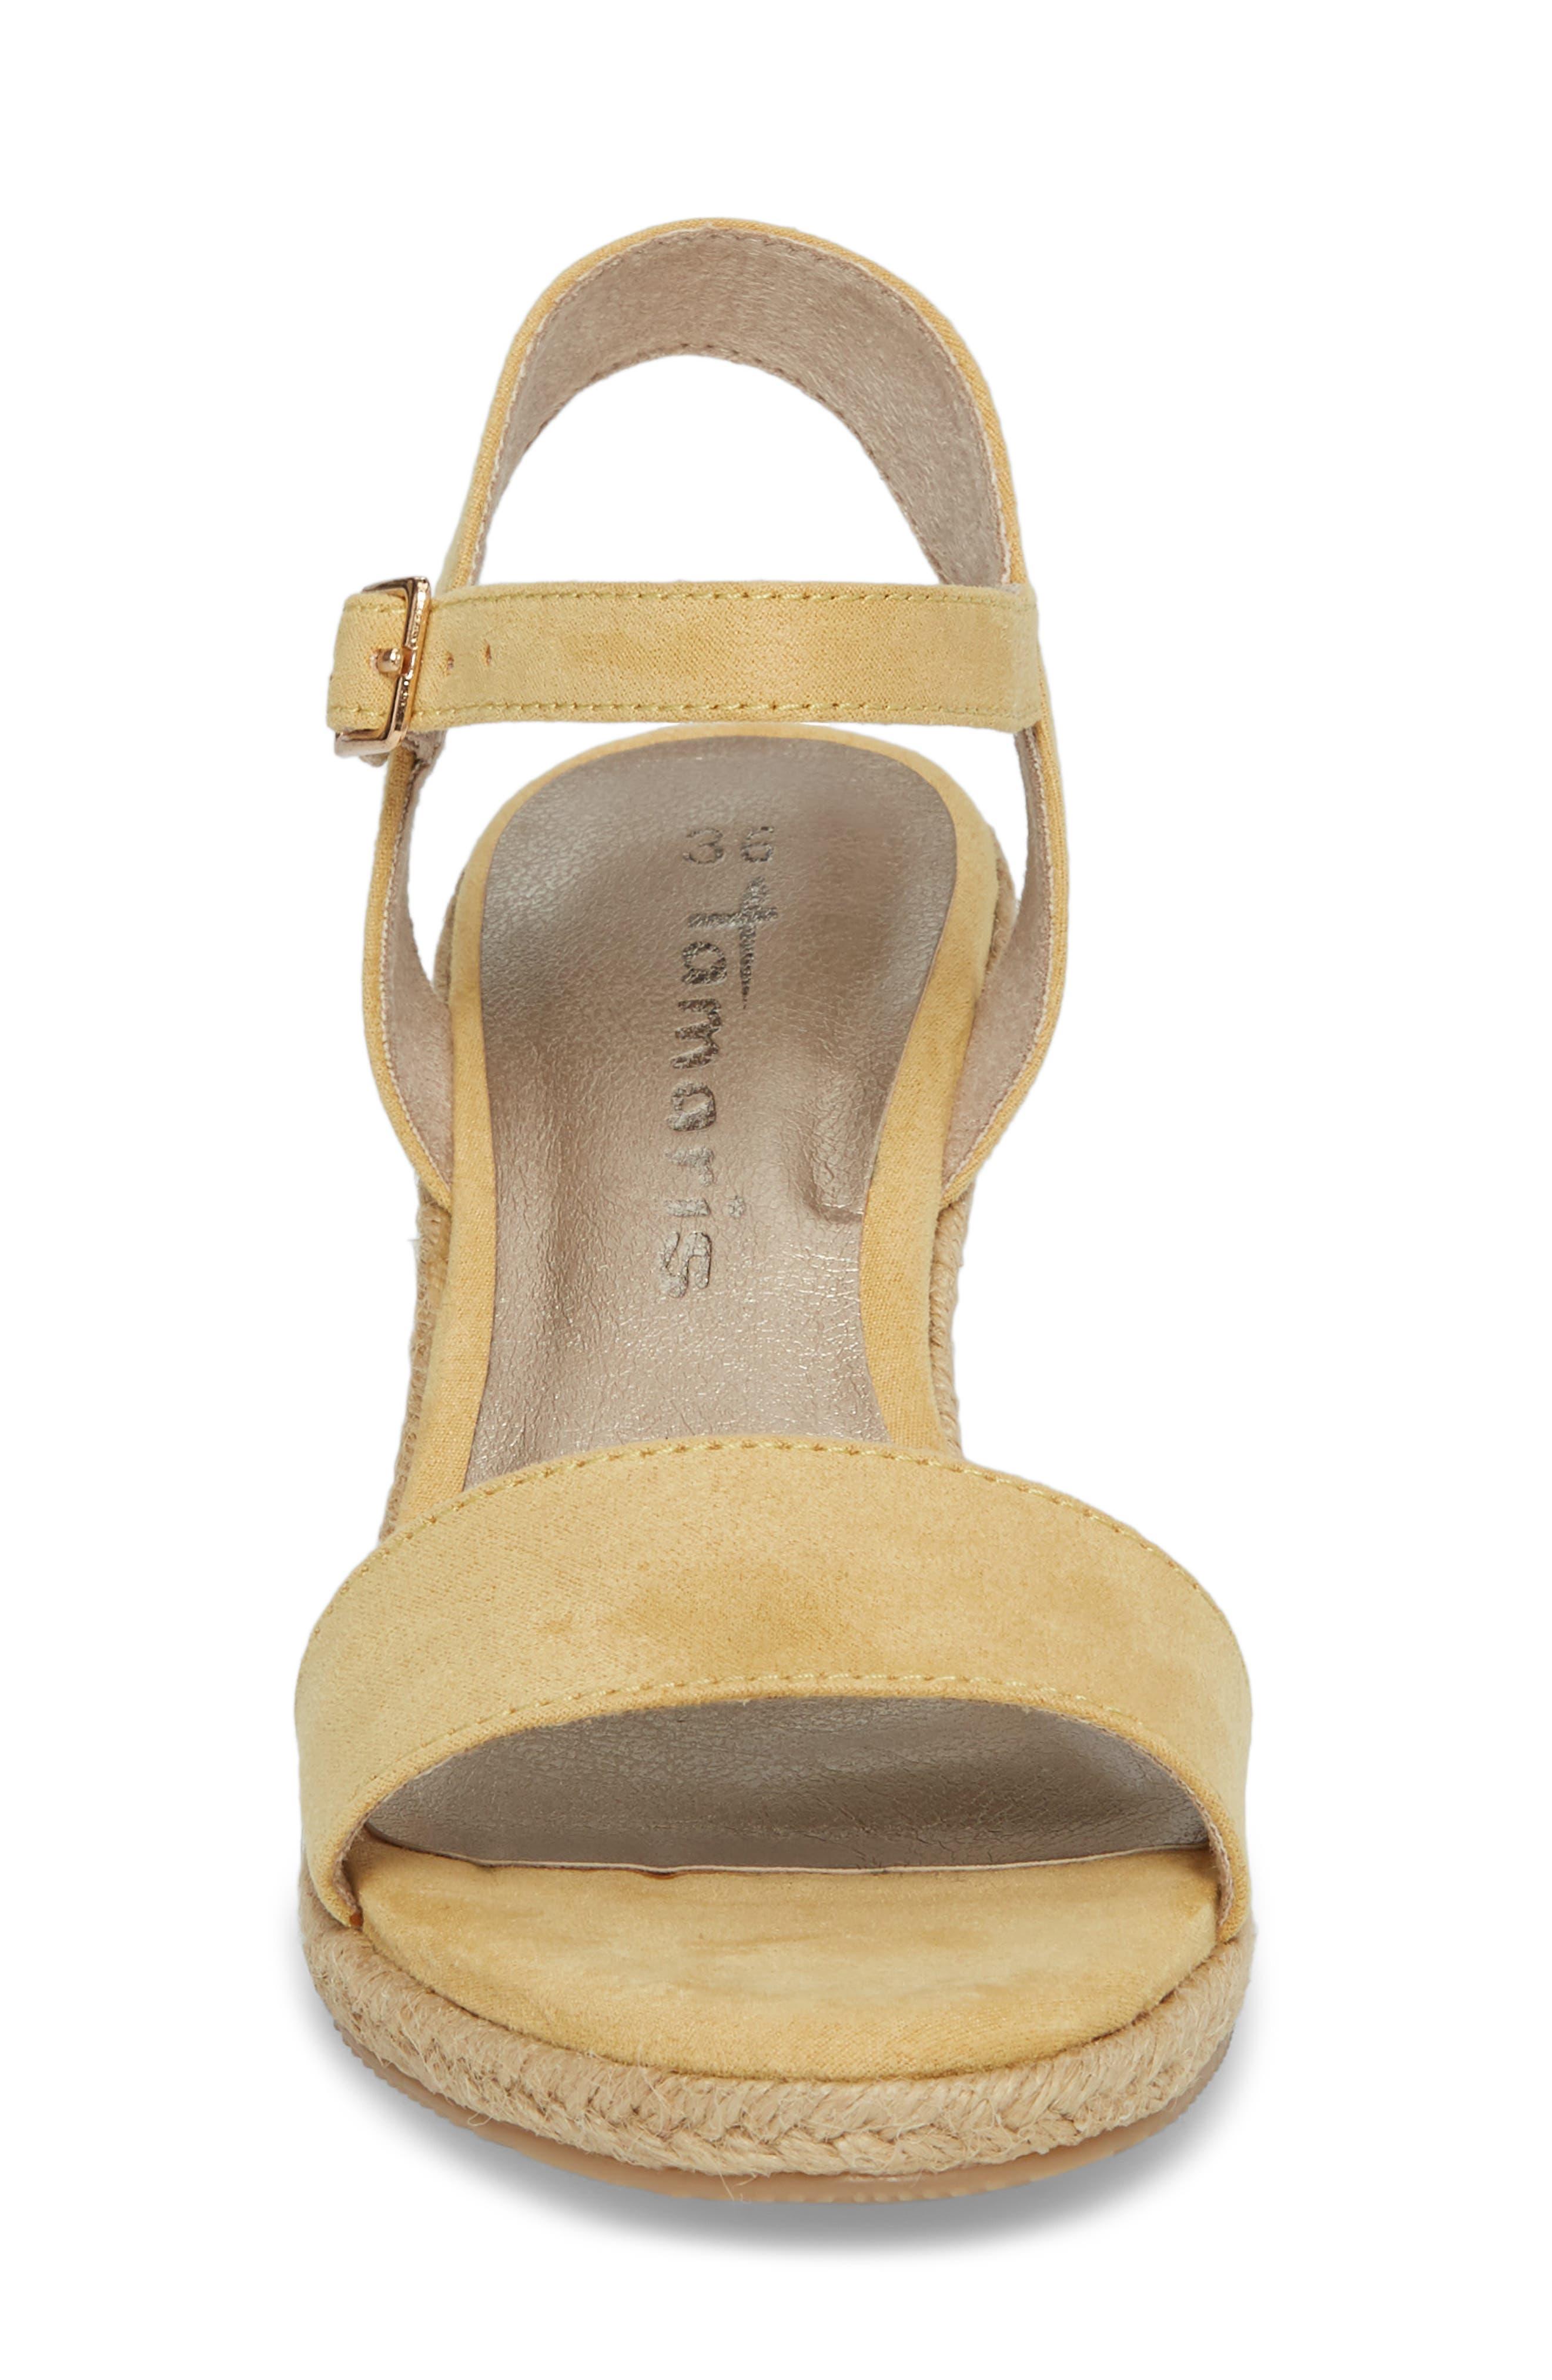 Livia Espadrille Wedge Sandal,                             Alternate thumbnail 4, color,                             Saffron Fabric